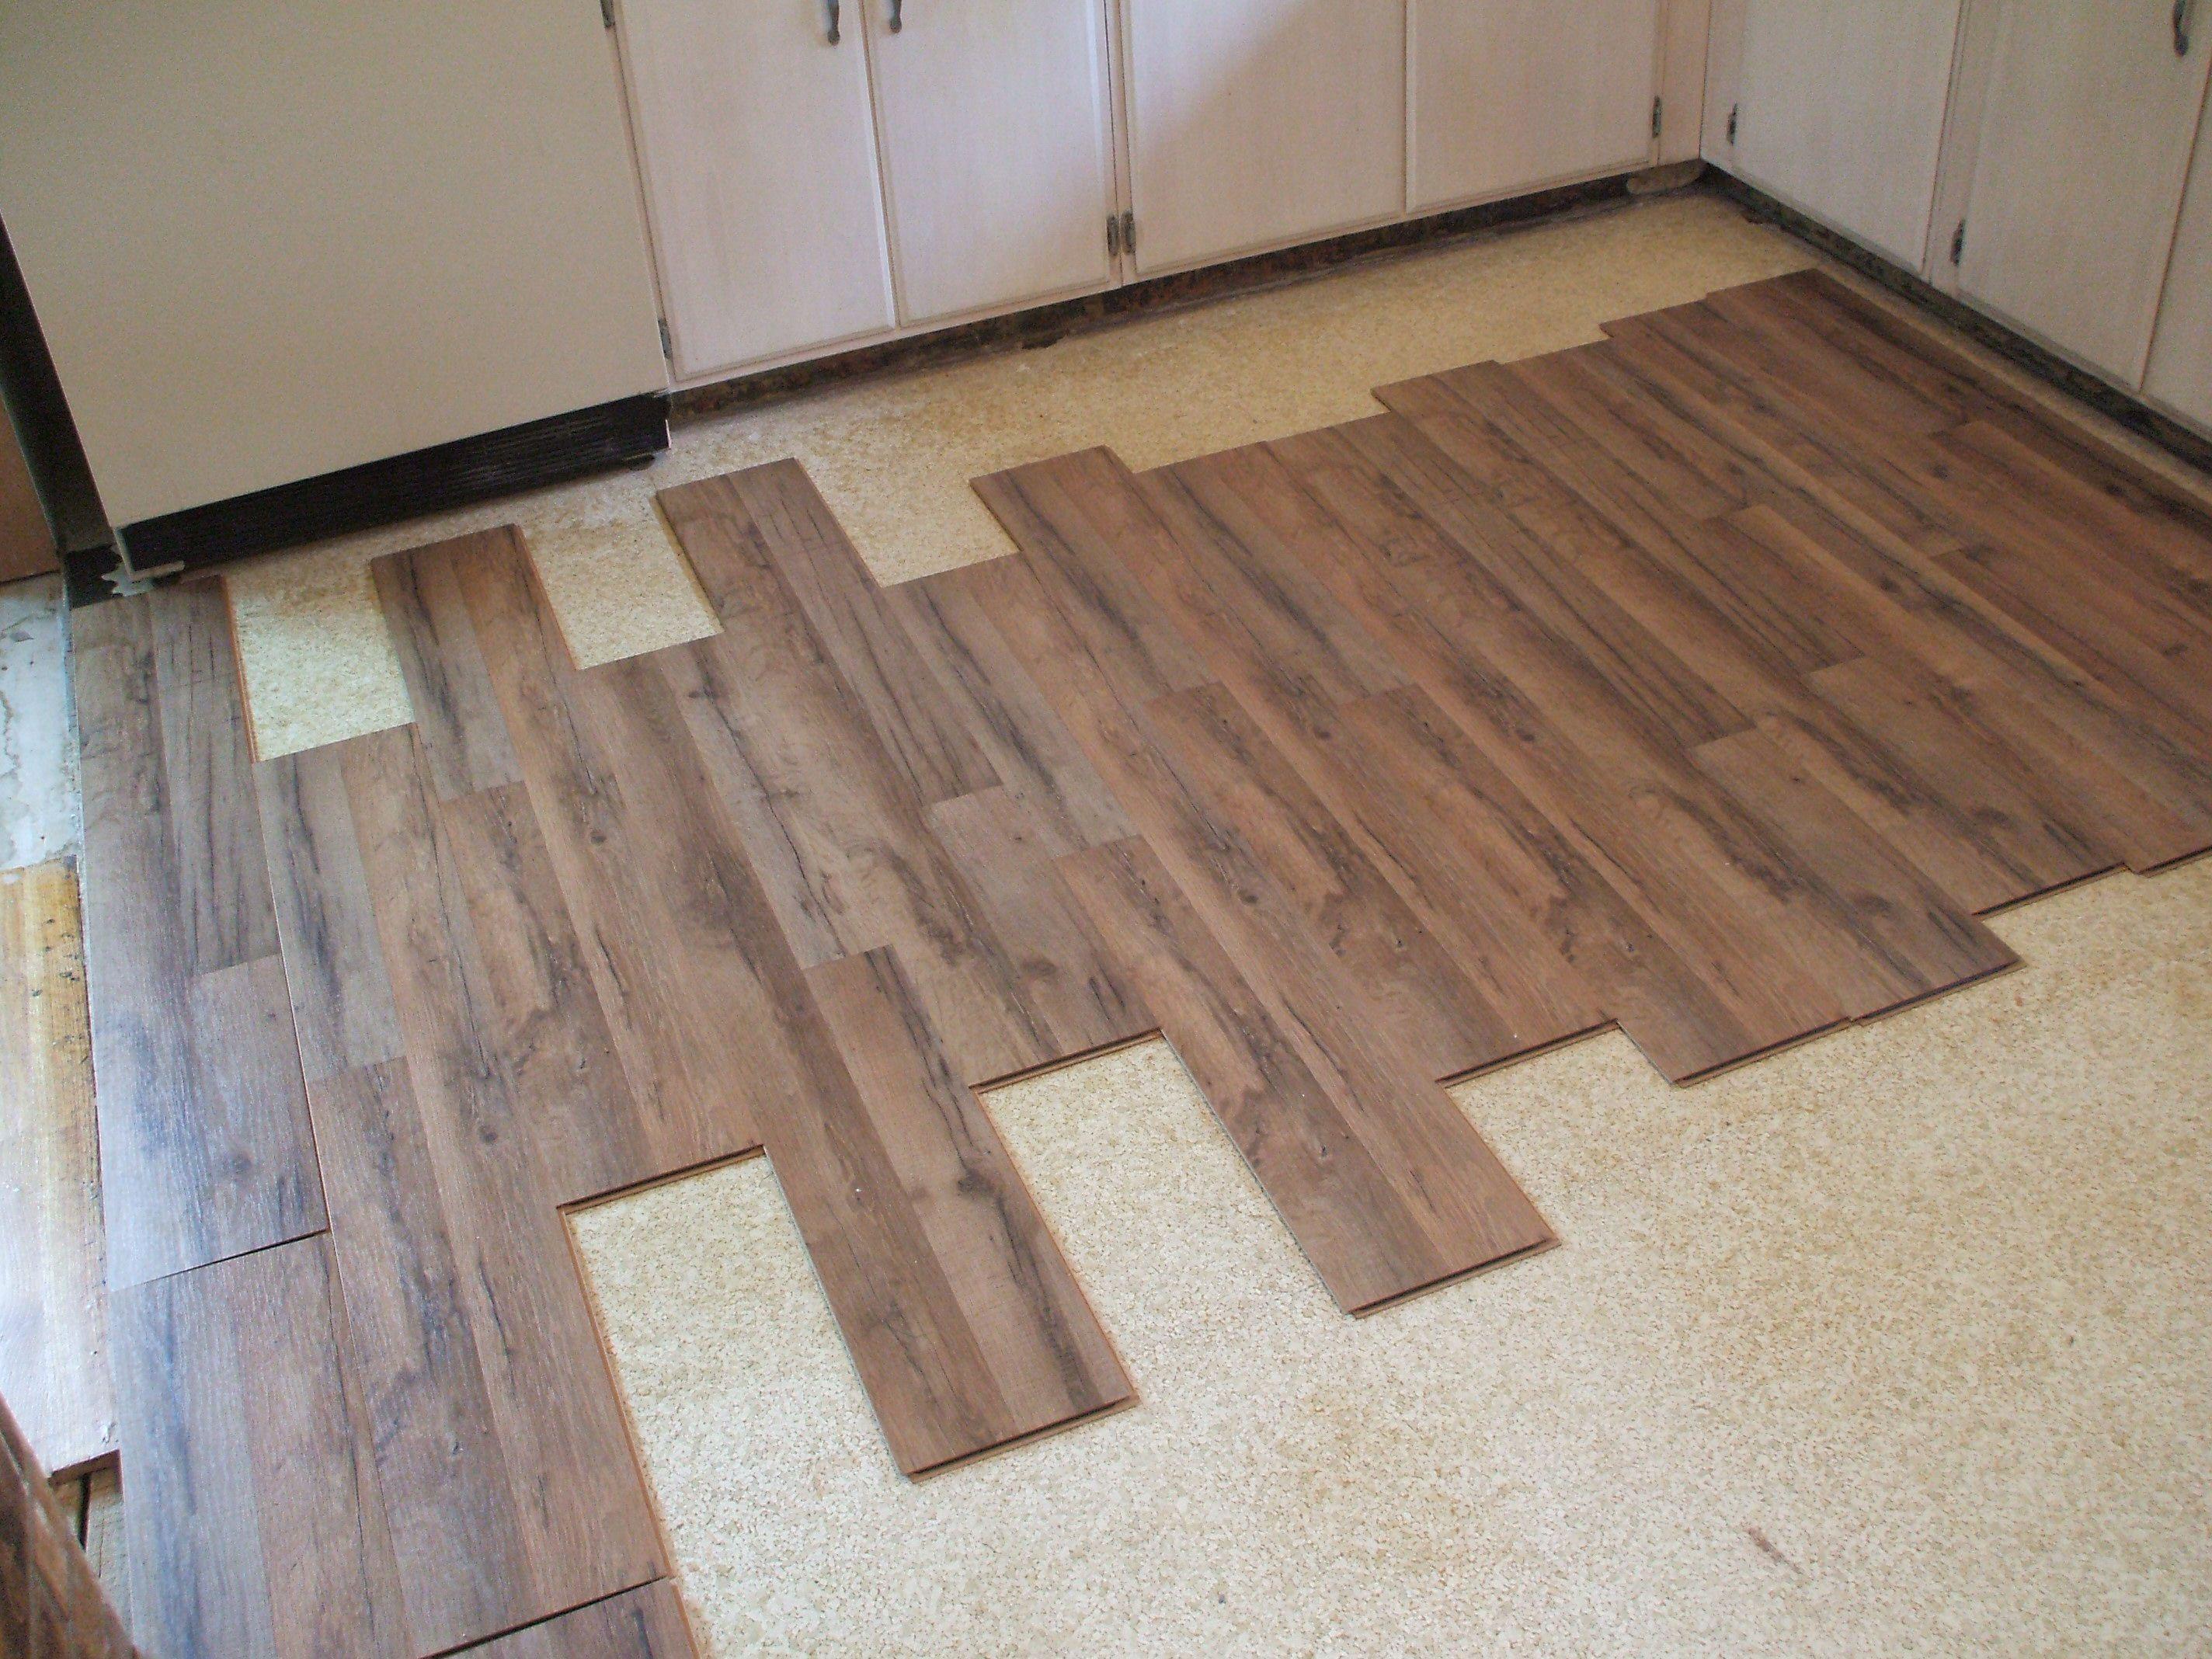 filling gaps in hardwood floors of laminate flooring installation made easy with regard to installing laminate eyeballing layout 56a49d075f9b58b7d0d7d693 jpg